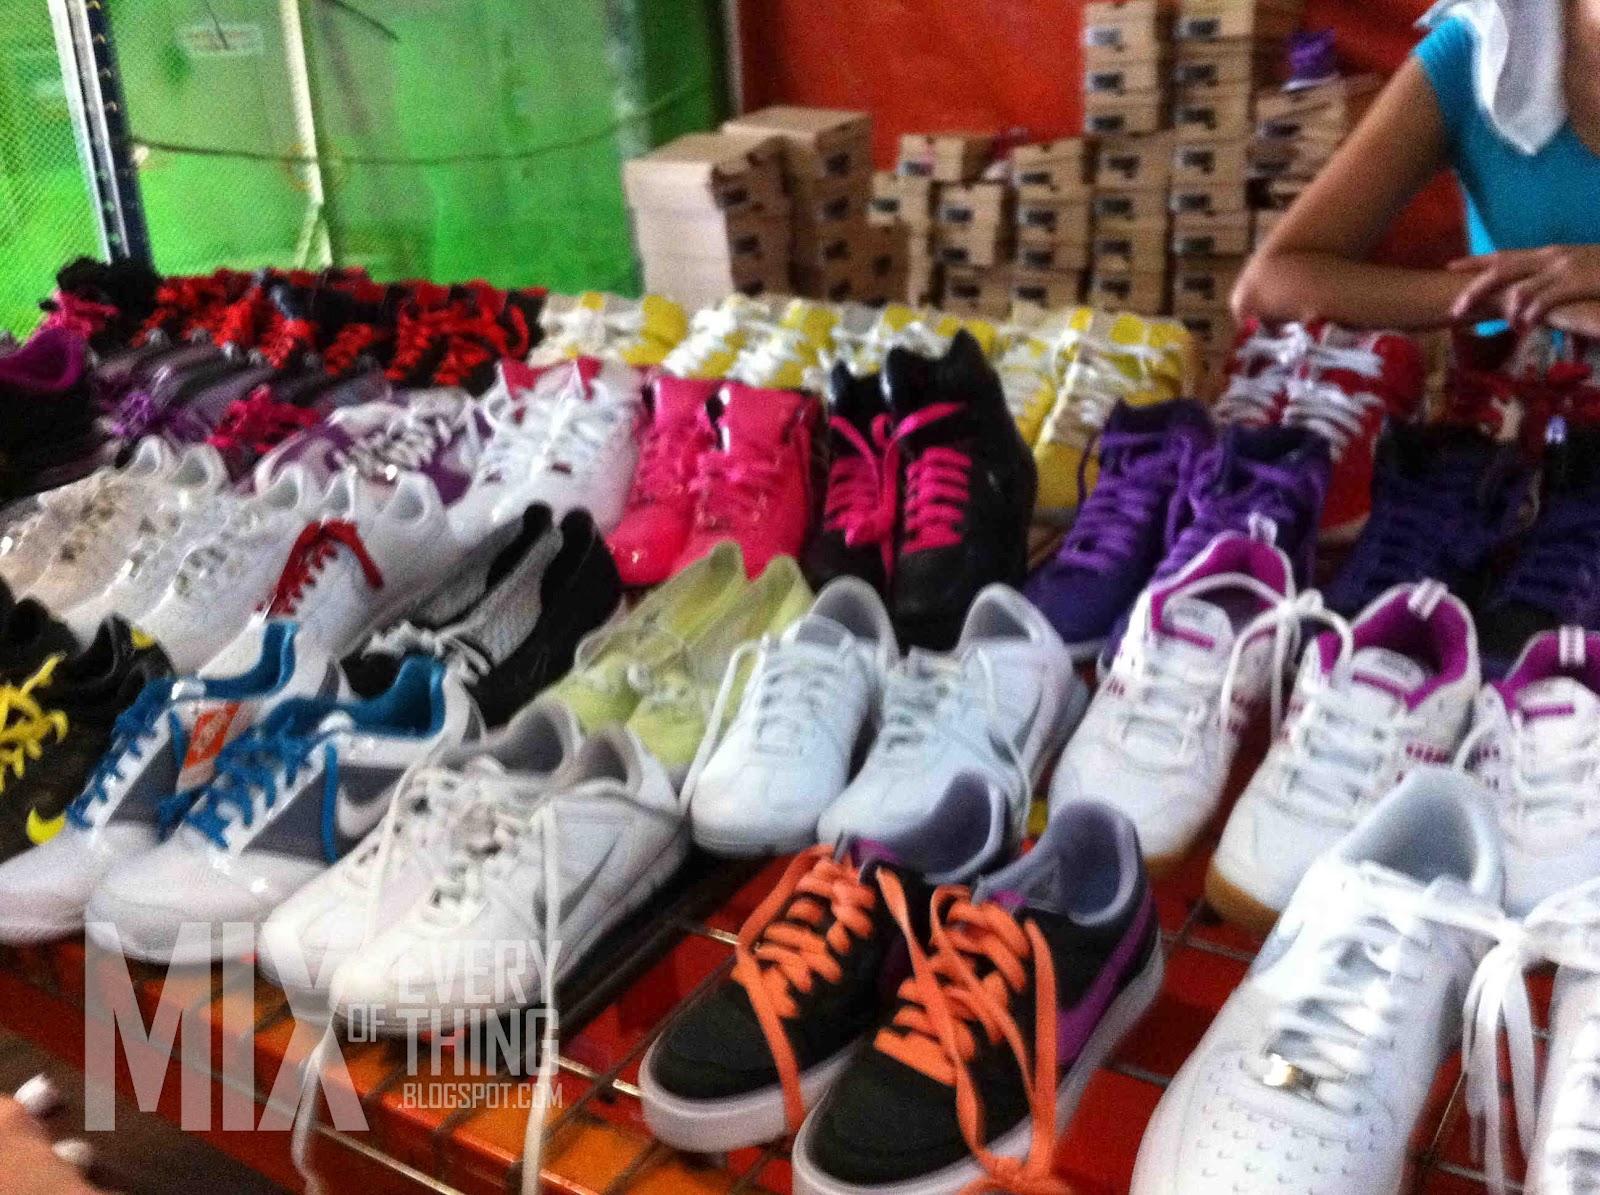 8360fcef206ea6 My Nike Warehouse Sale experience. - Hello! Welcome to my blog!